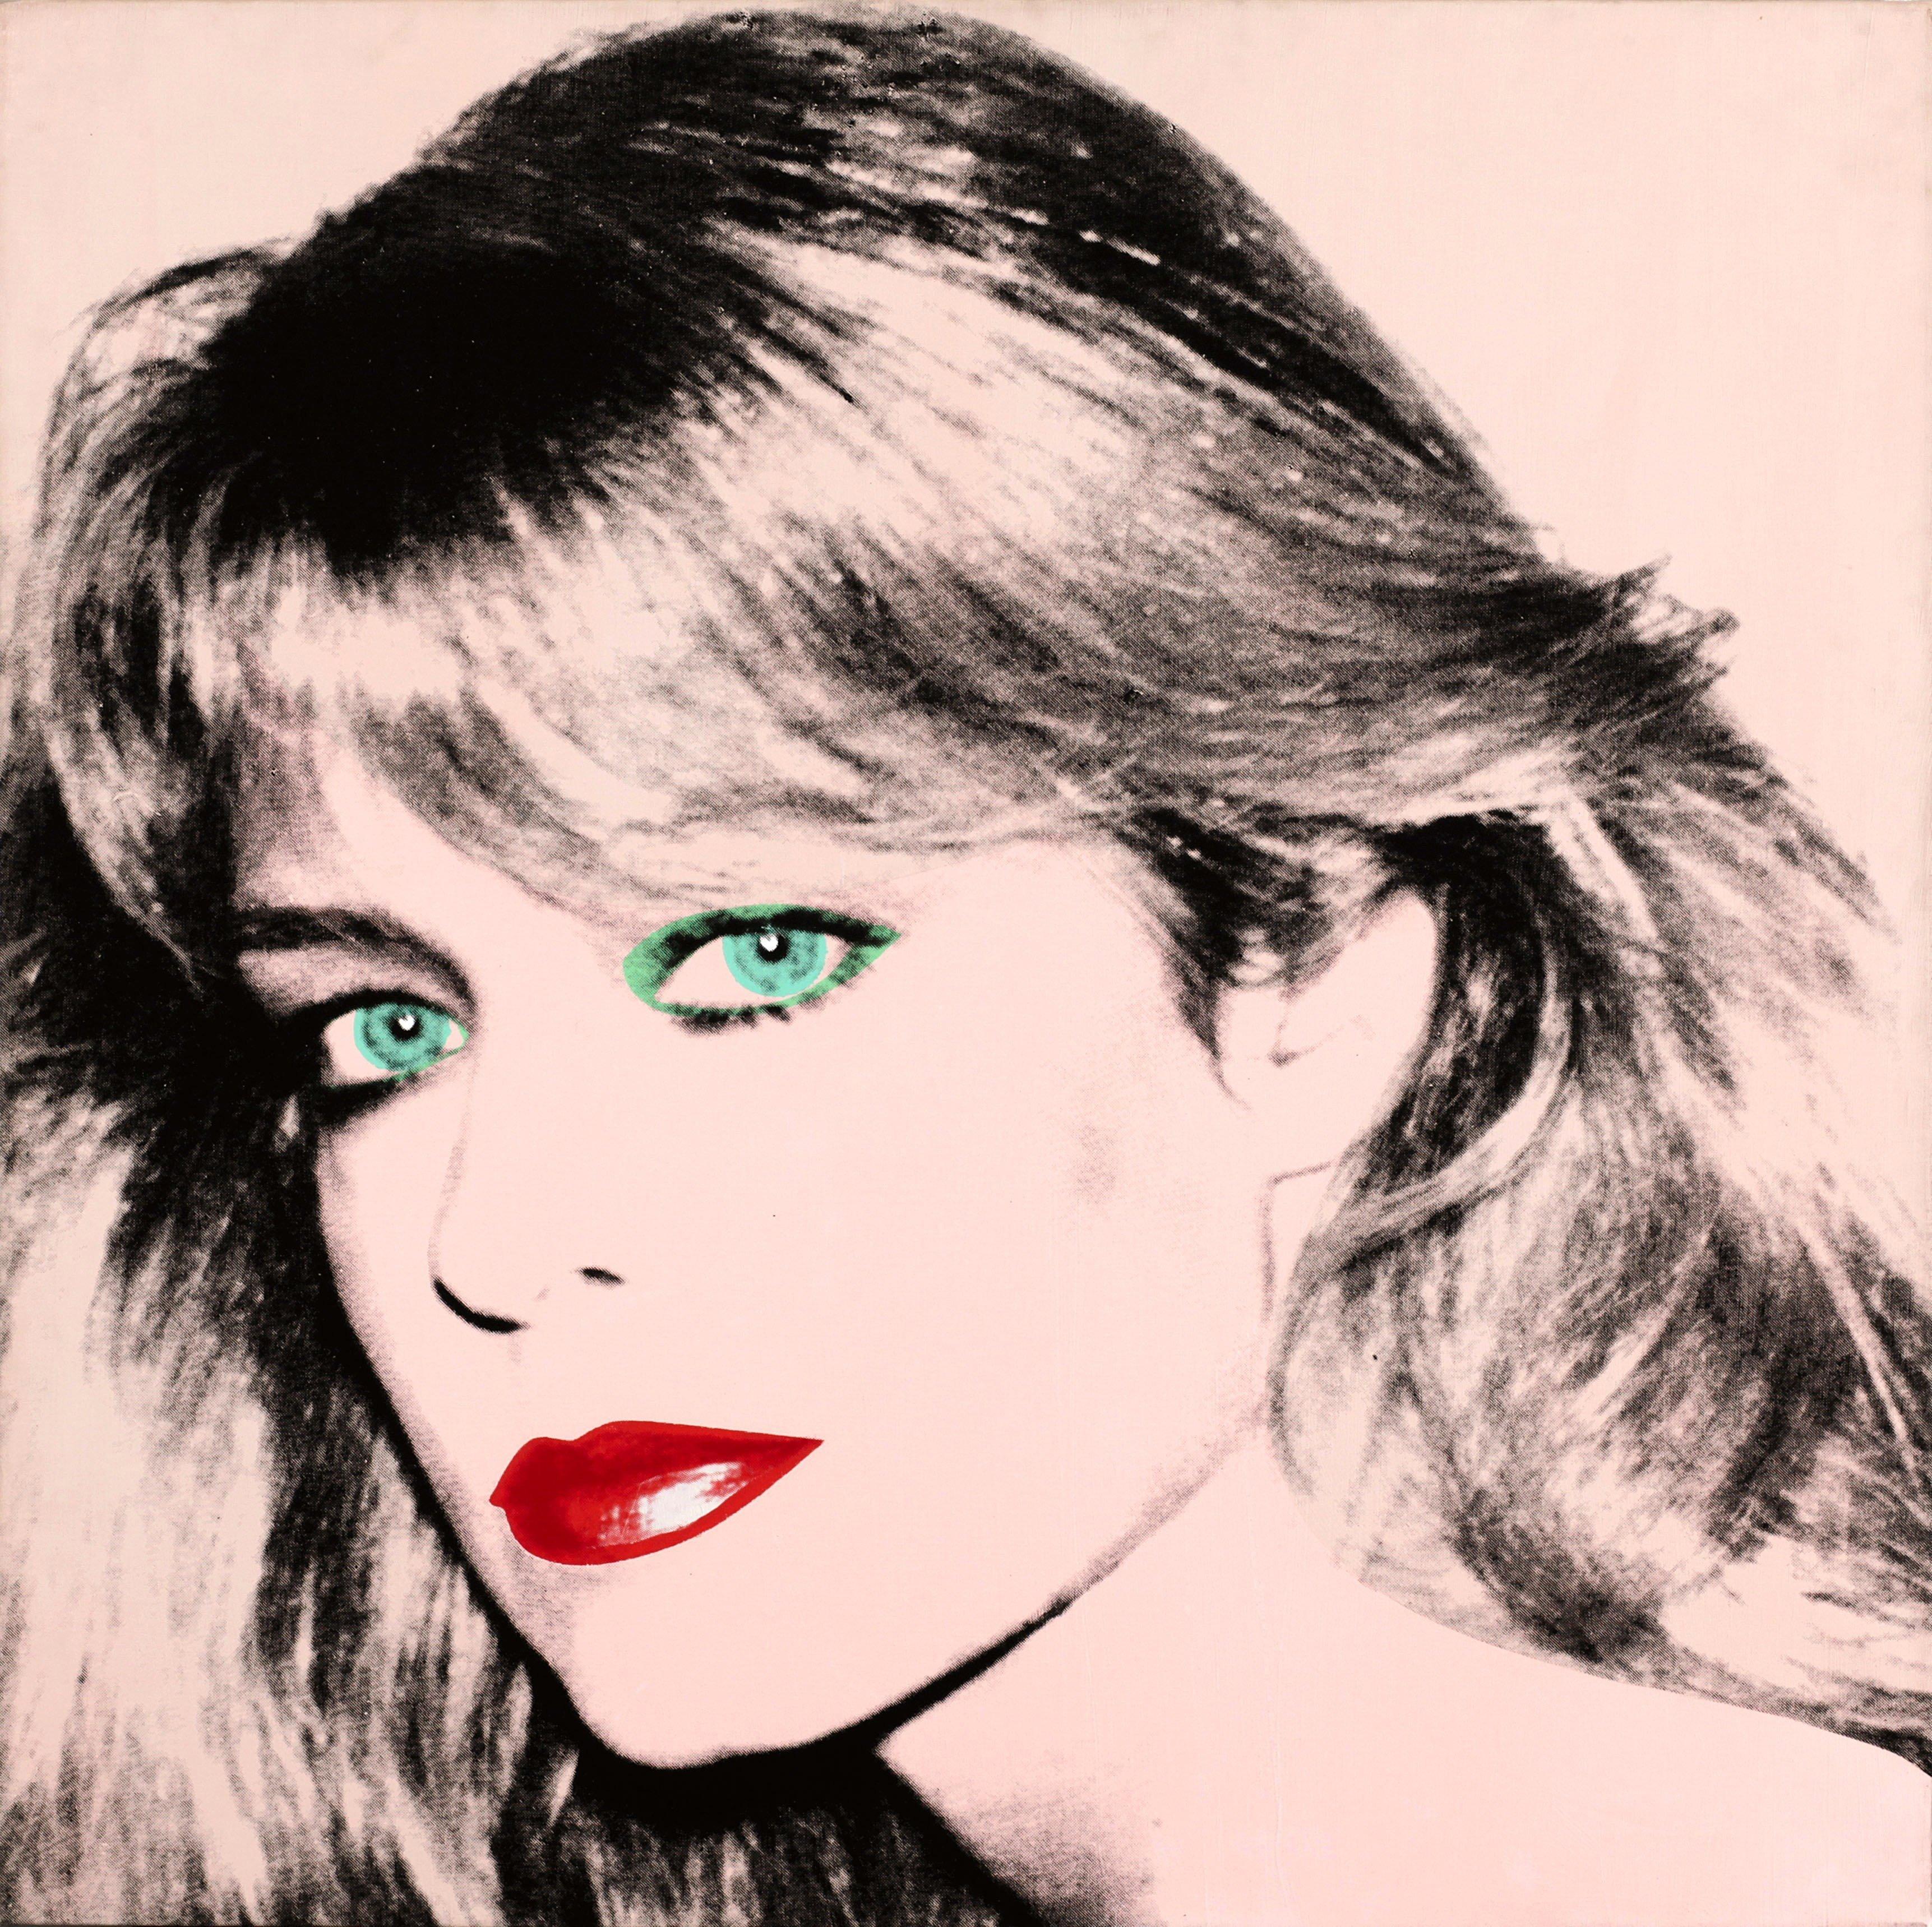 Ryan O'Neal Wins Warhol's Farrah Fawcett Portrait – Center